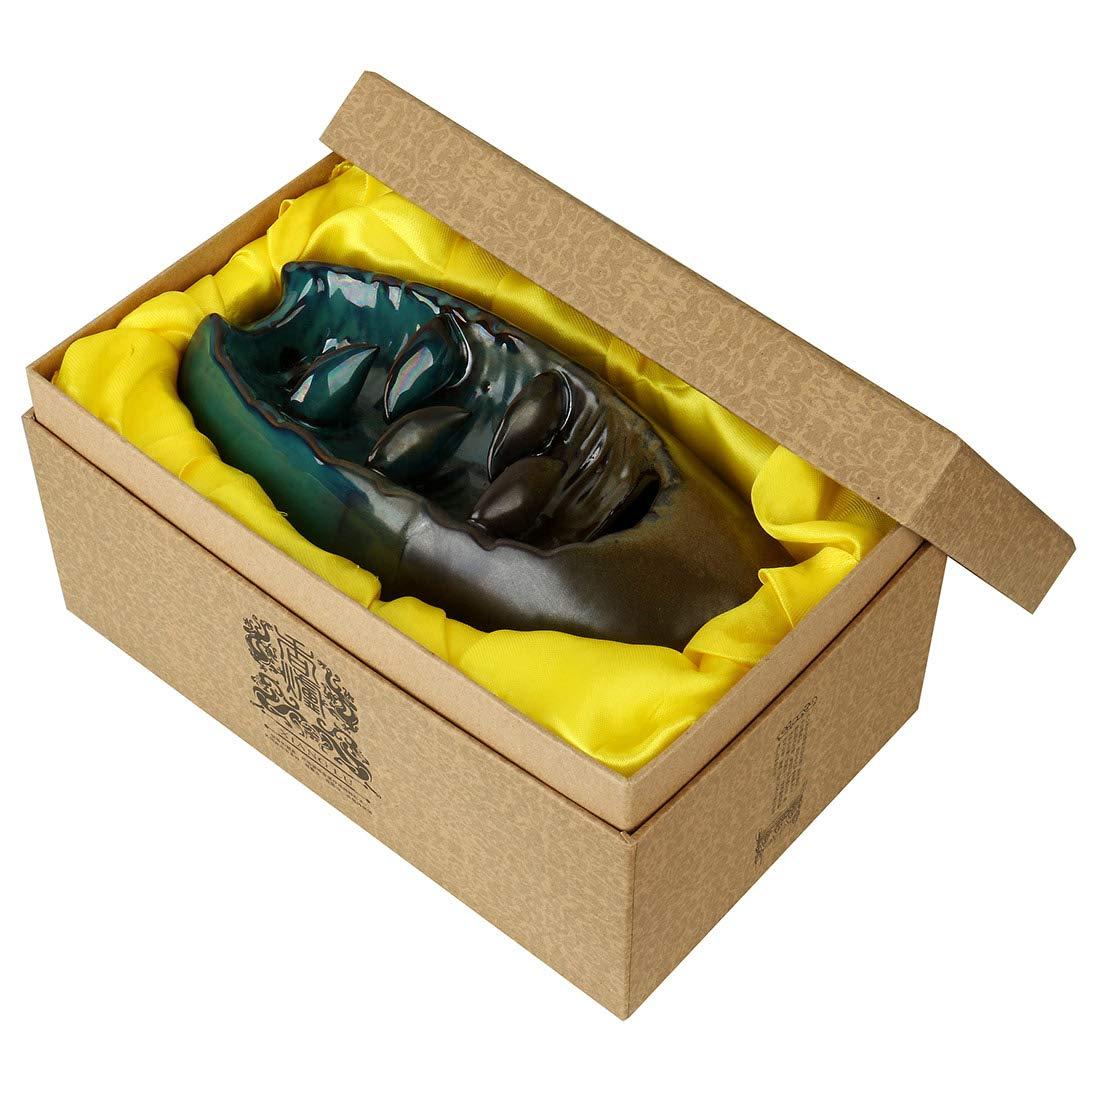 AlenX Backflow Incense Holder, Home Incense Burner 10PCs Backflow Incense, Ceramic Incense Holder Incense Burner (90x90x205mm) by YYW (Image #2)